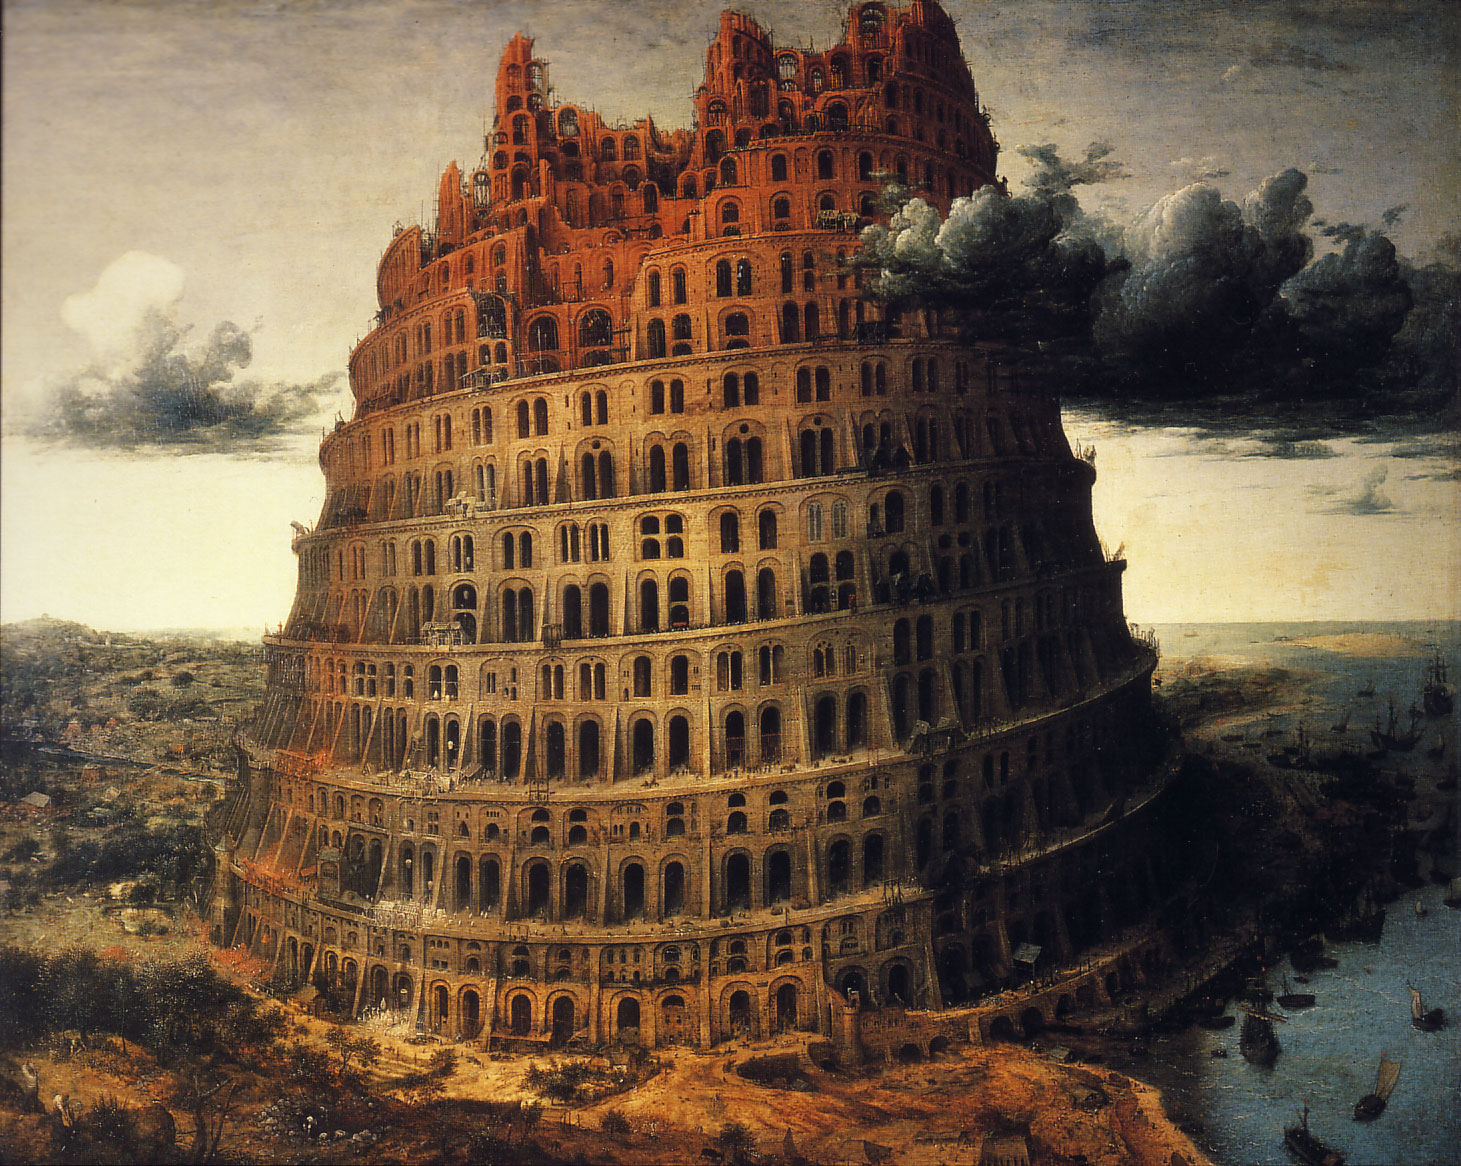 tower_of_babel170113154.jpg